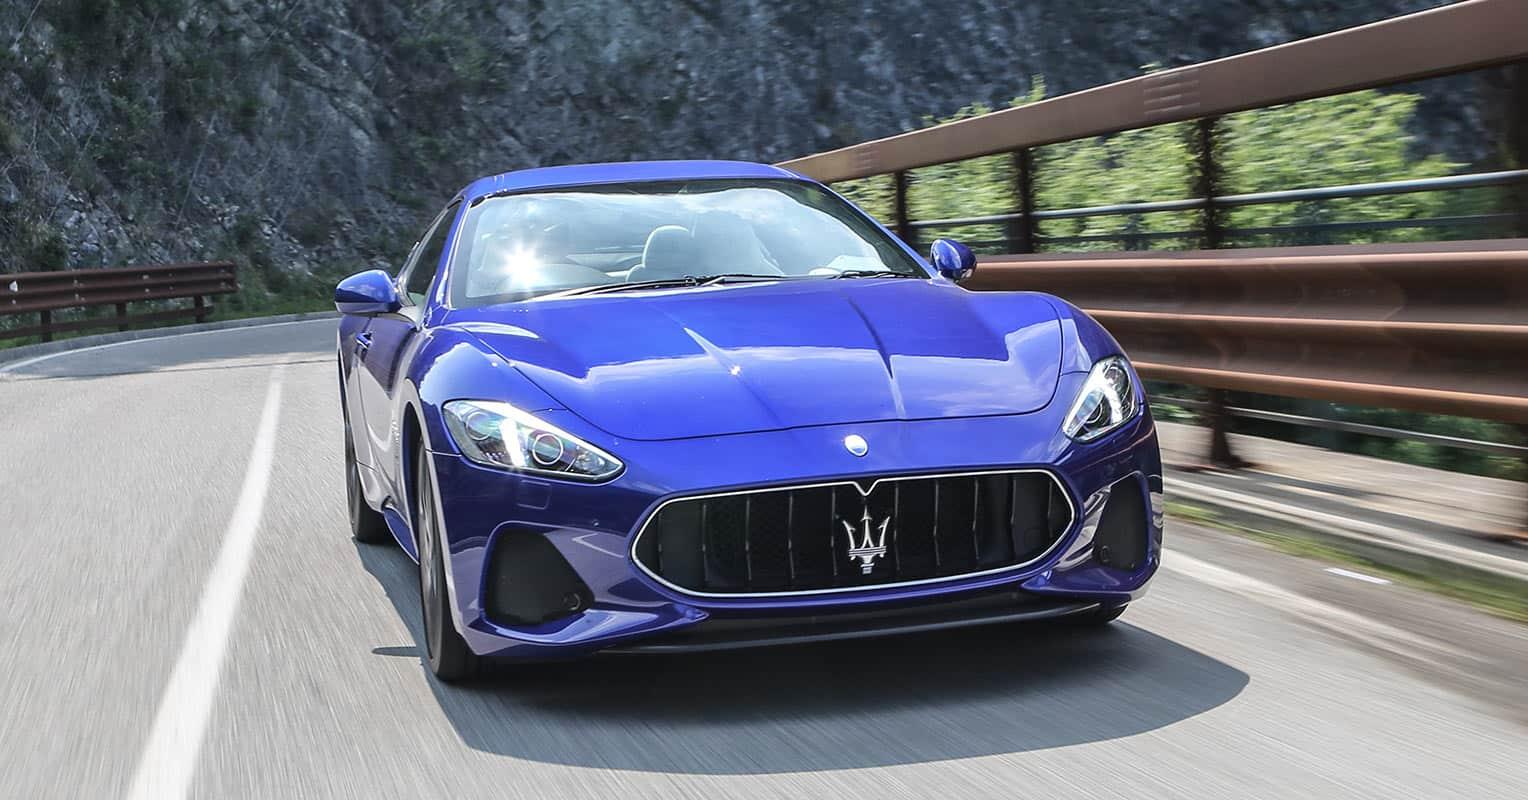 Maserati GranTurismo Coupé frontal